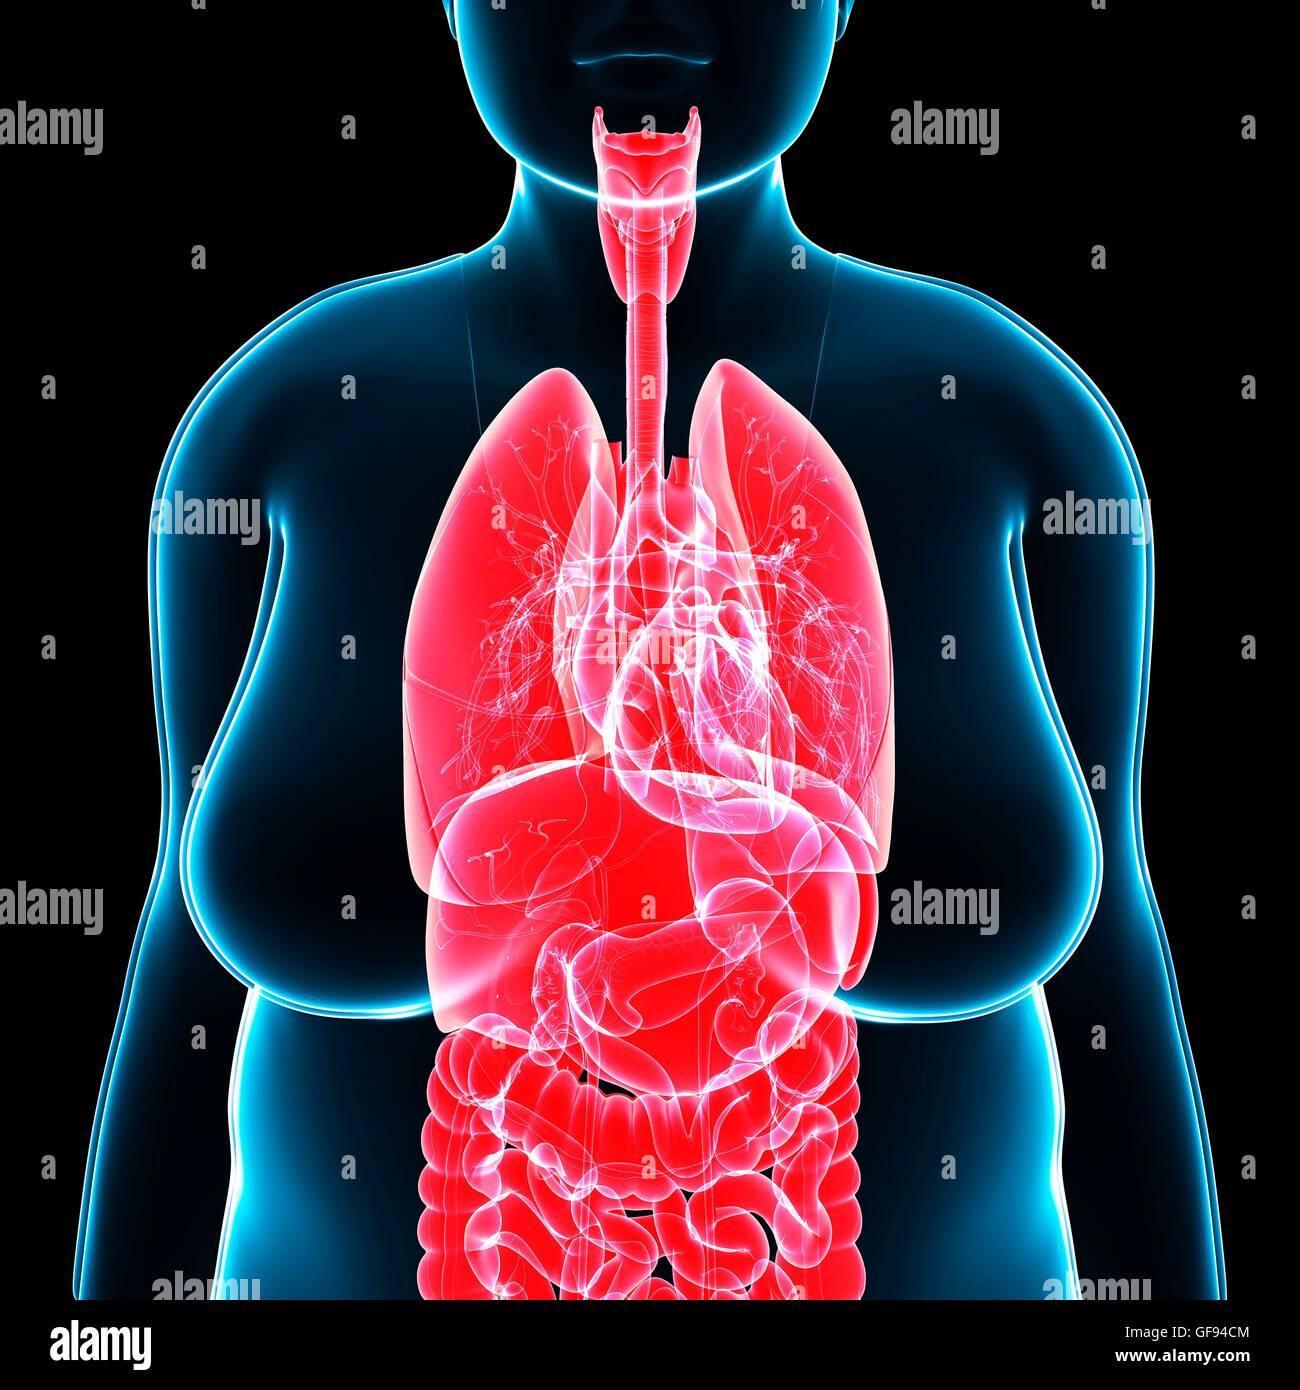 Illustration Of Female Internal Anatomy Stock Photo 112683108 Alamy